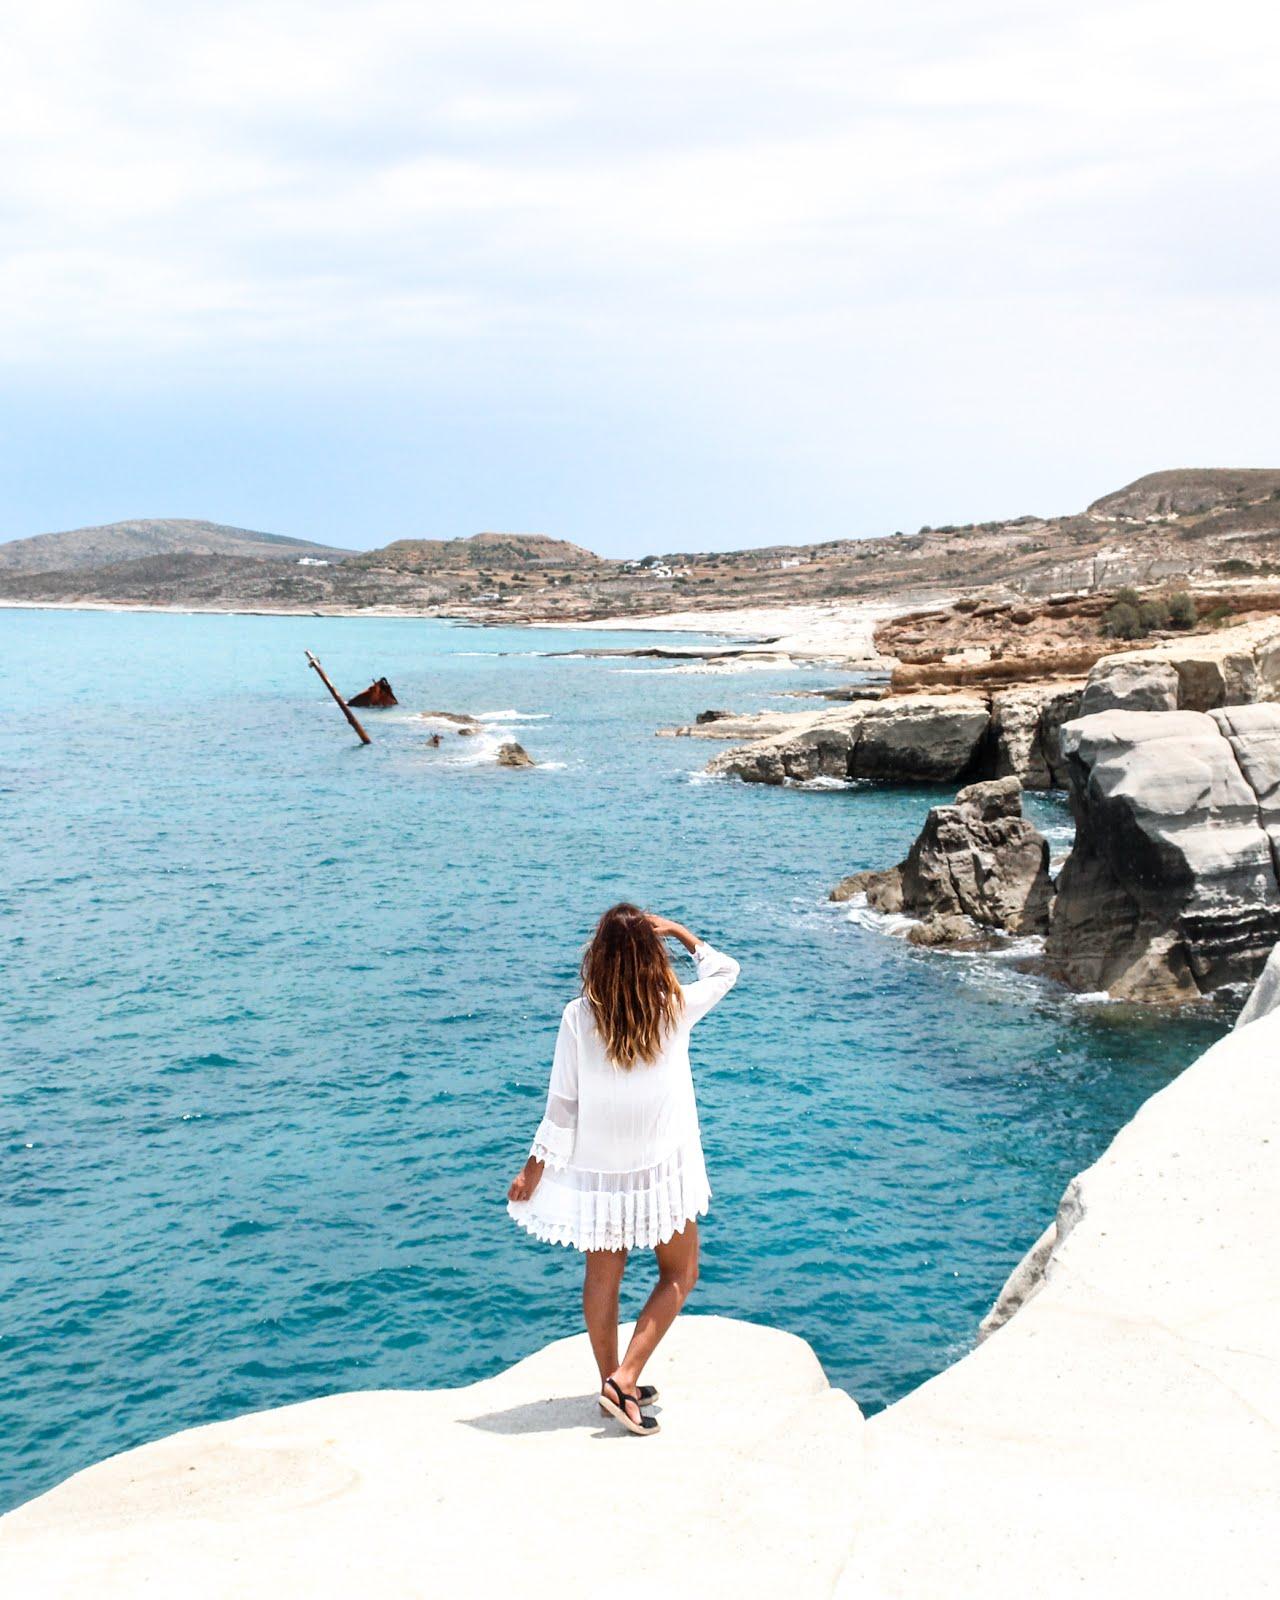 Sarakiniko Beach Shio Wreck in Milos island, Greece